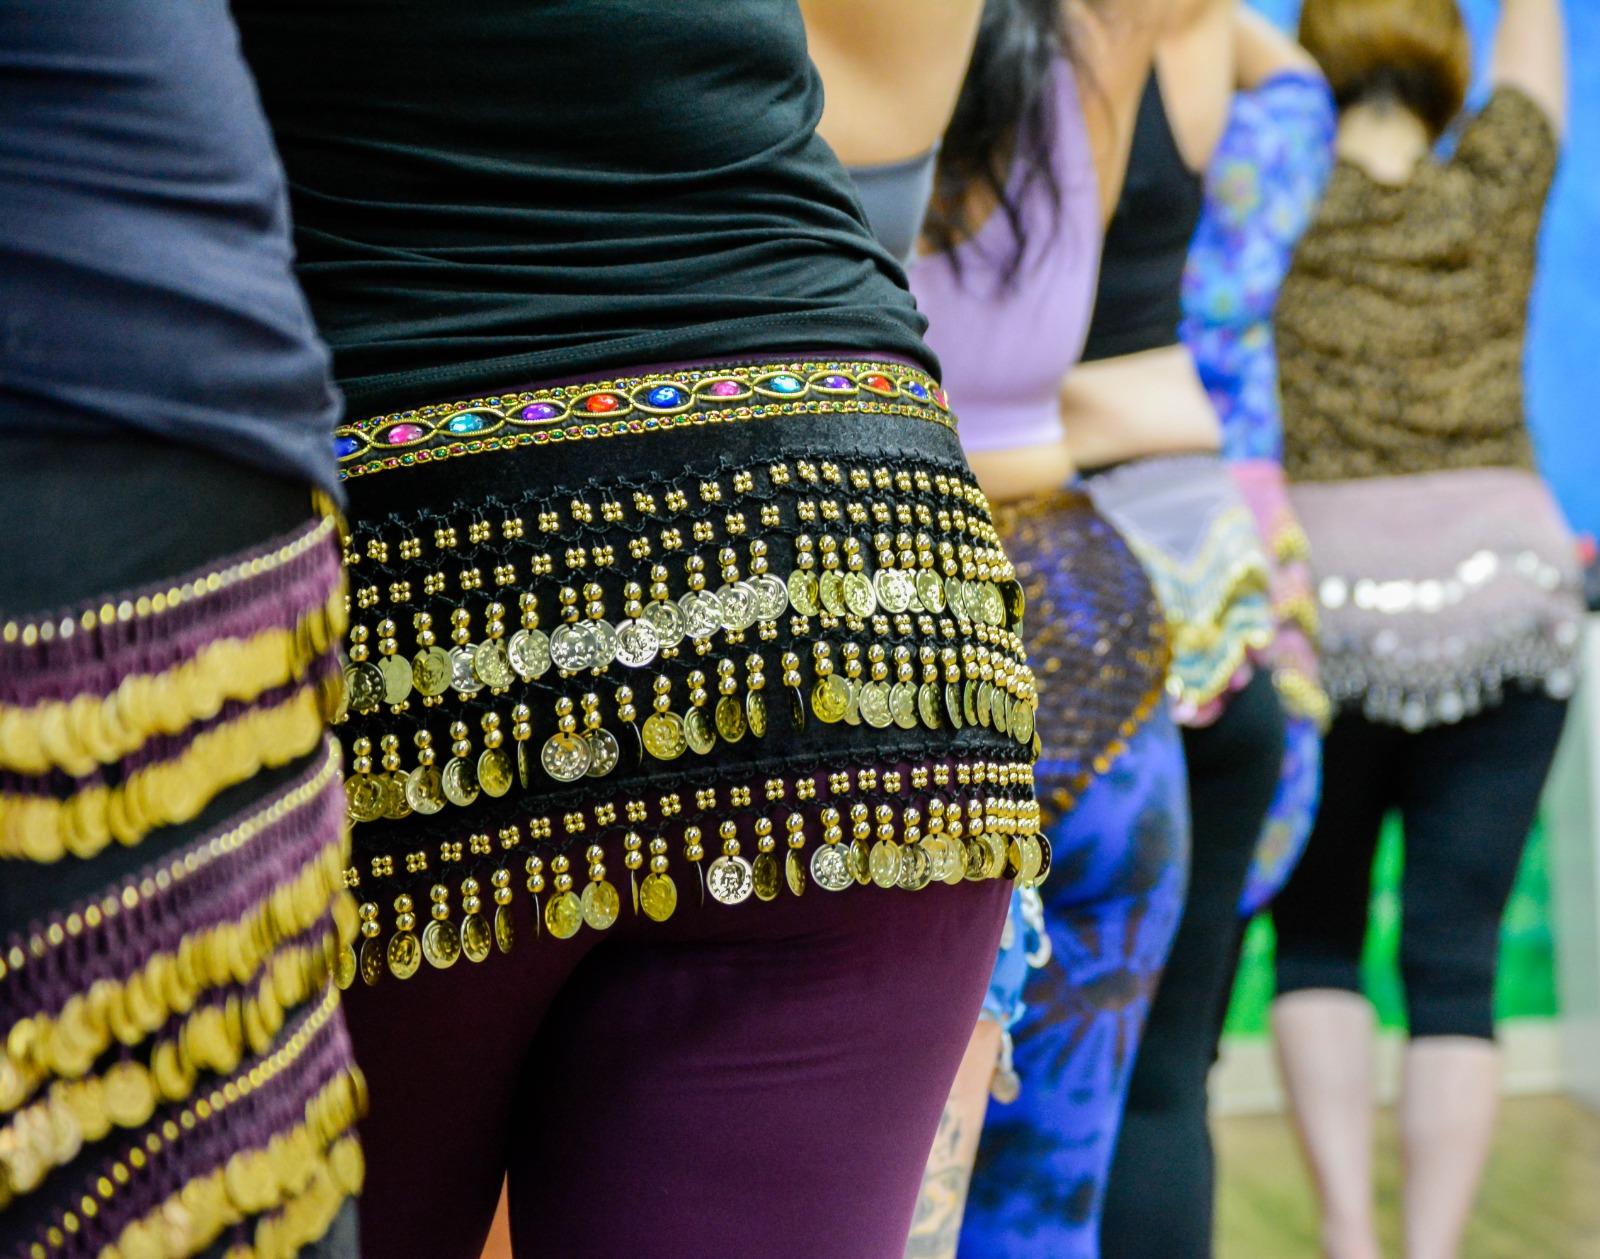 Belly dance students wearing hip scarves in Phoenix belly dance class